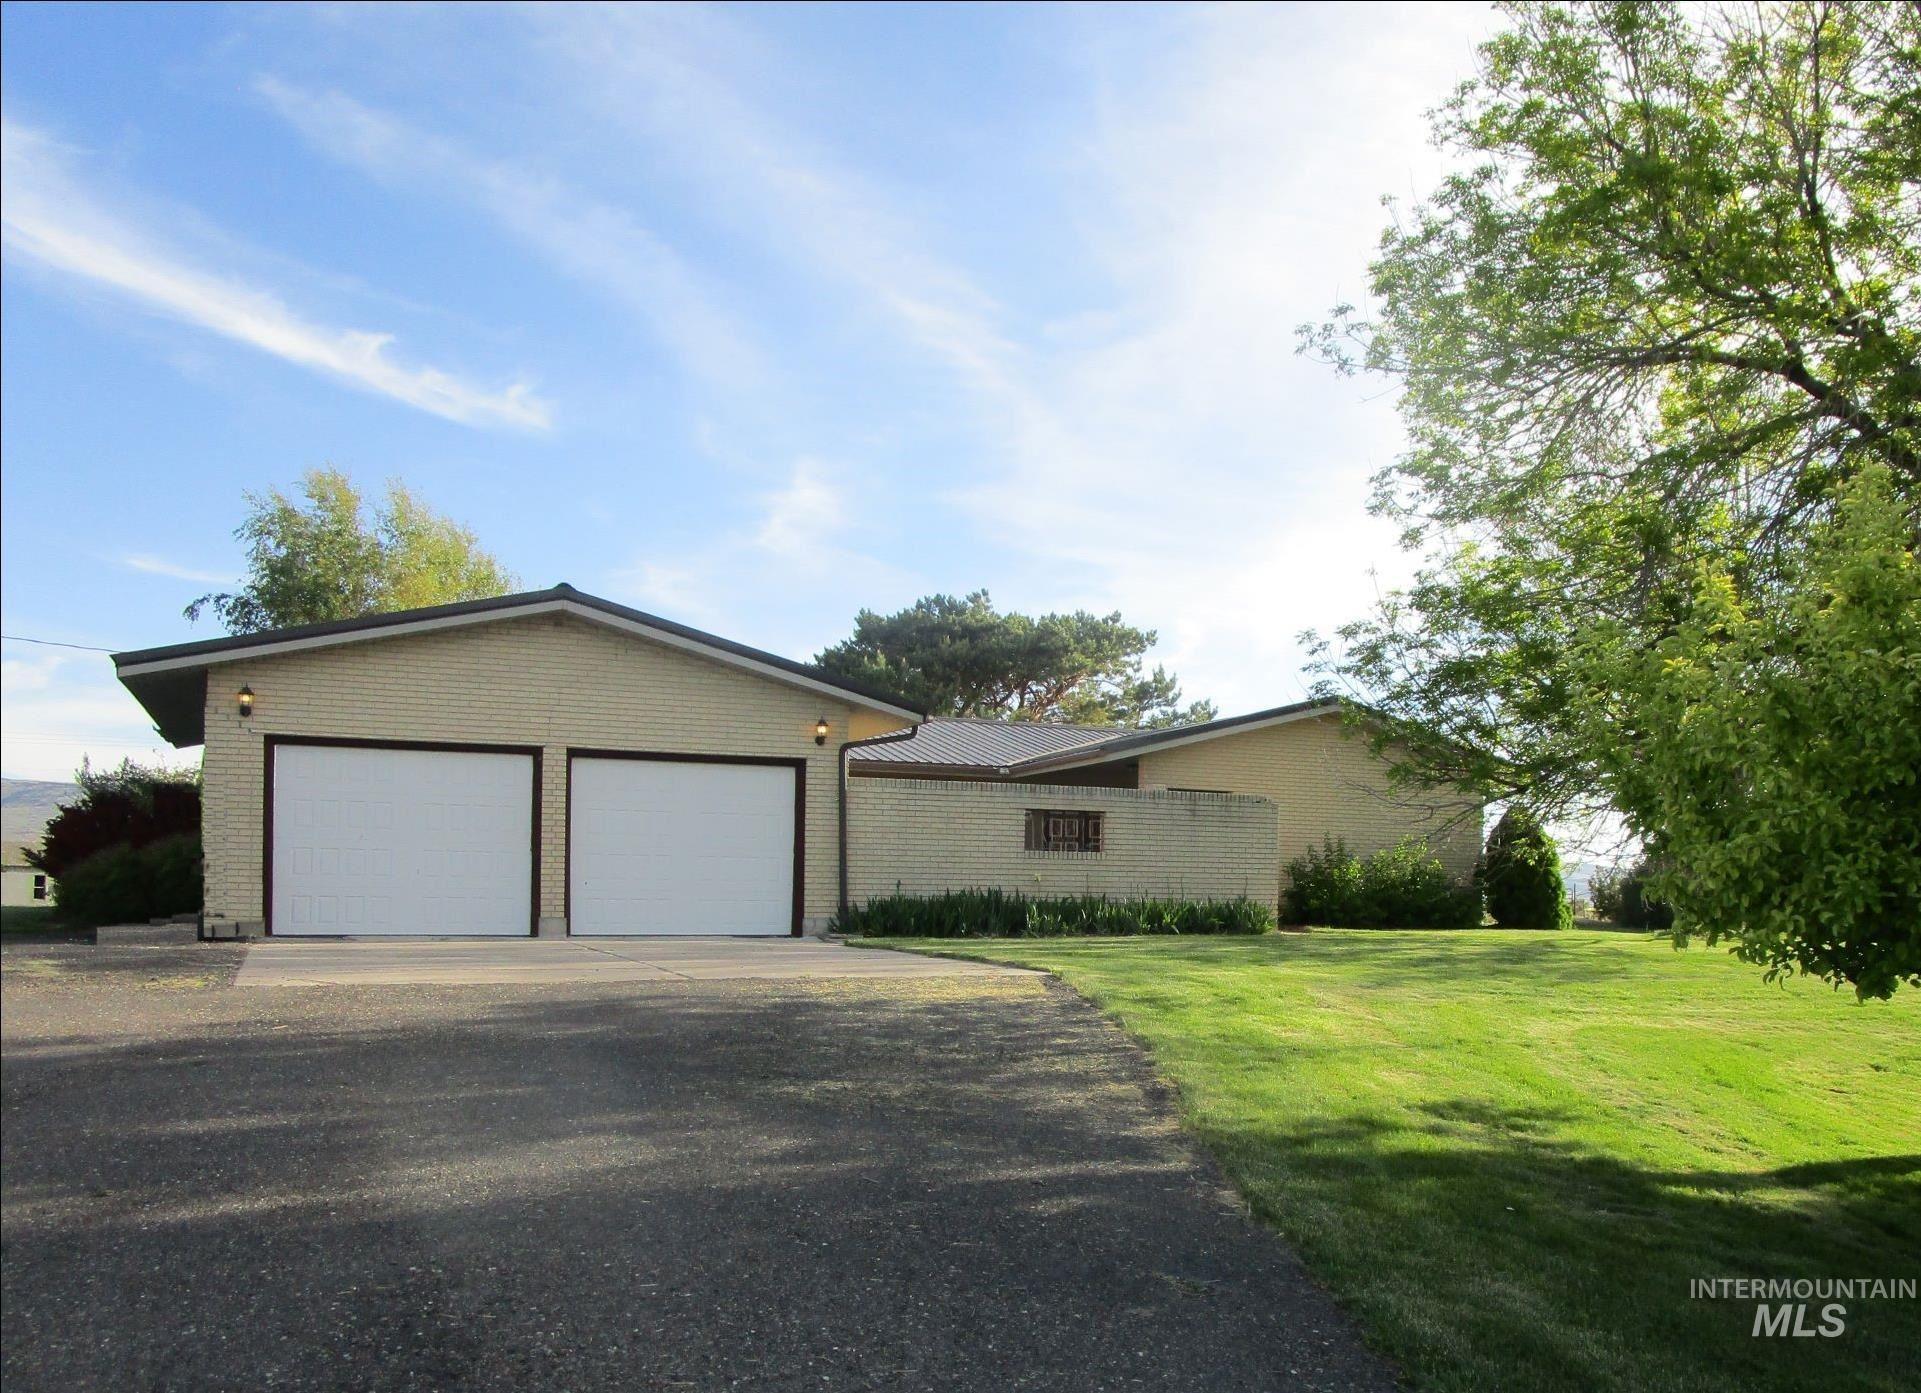 3005 N 4900 E Property Photo 1